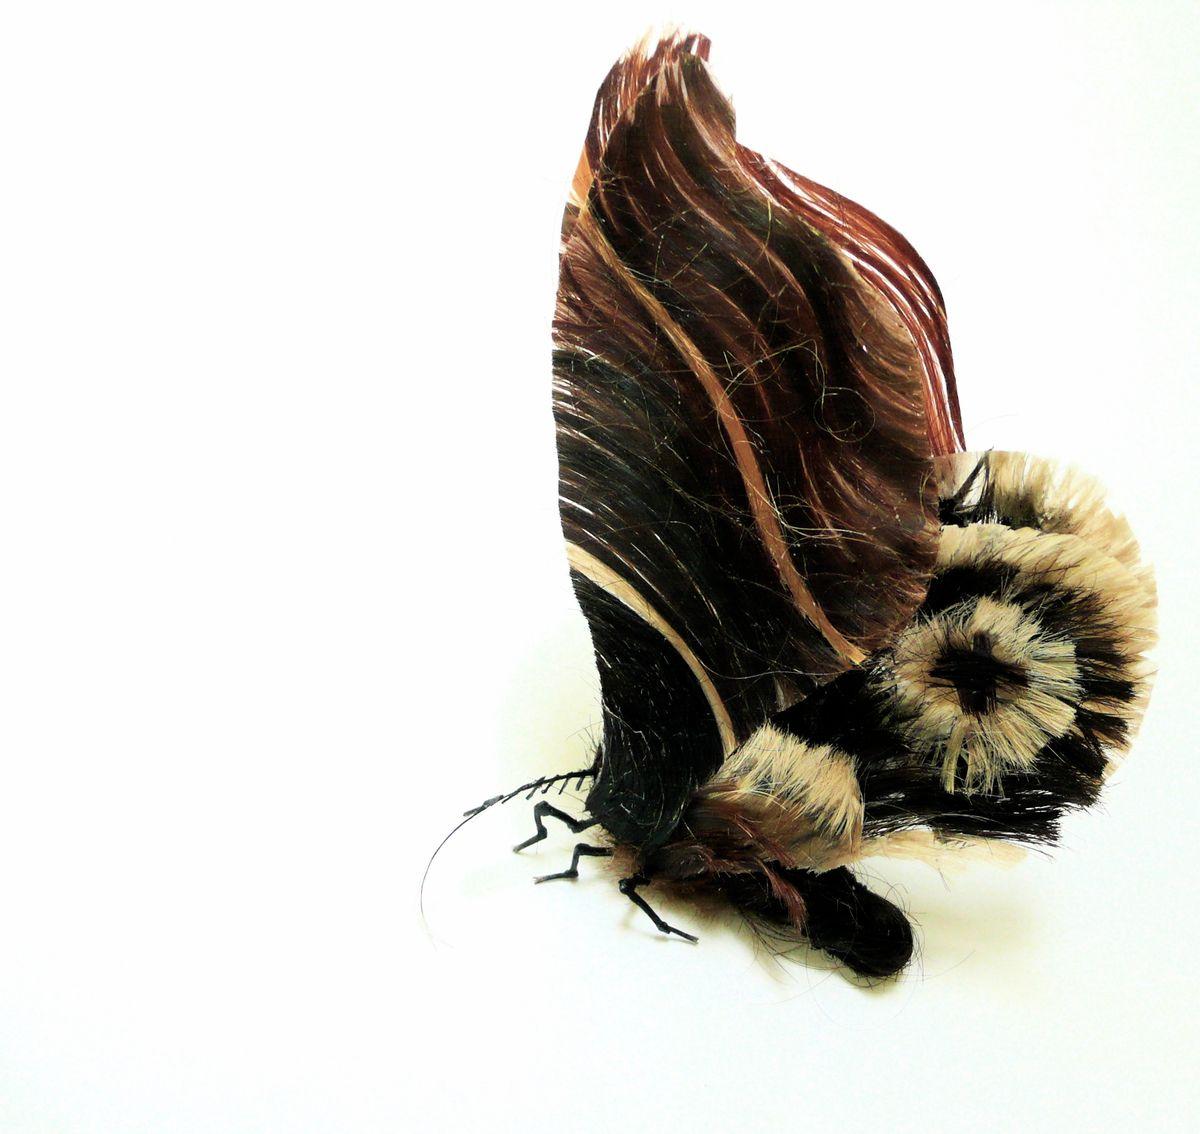 A moth made from human hair and glue. (Artist: Adrienne Antonson)